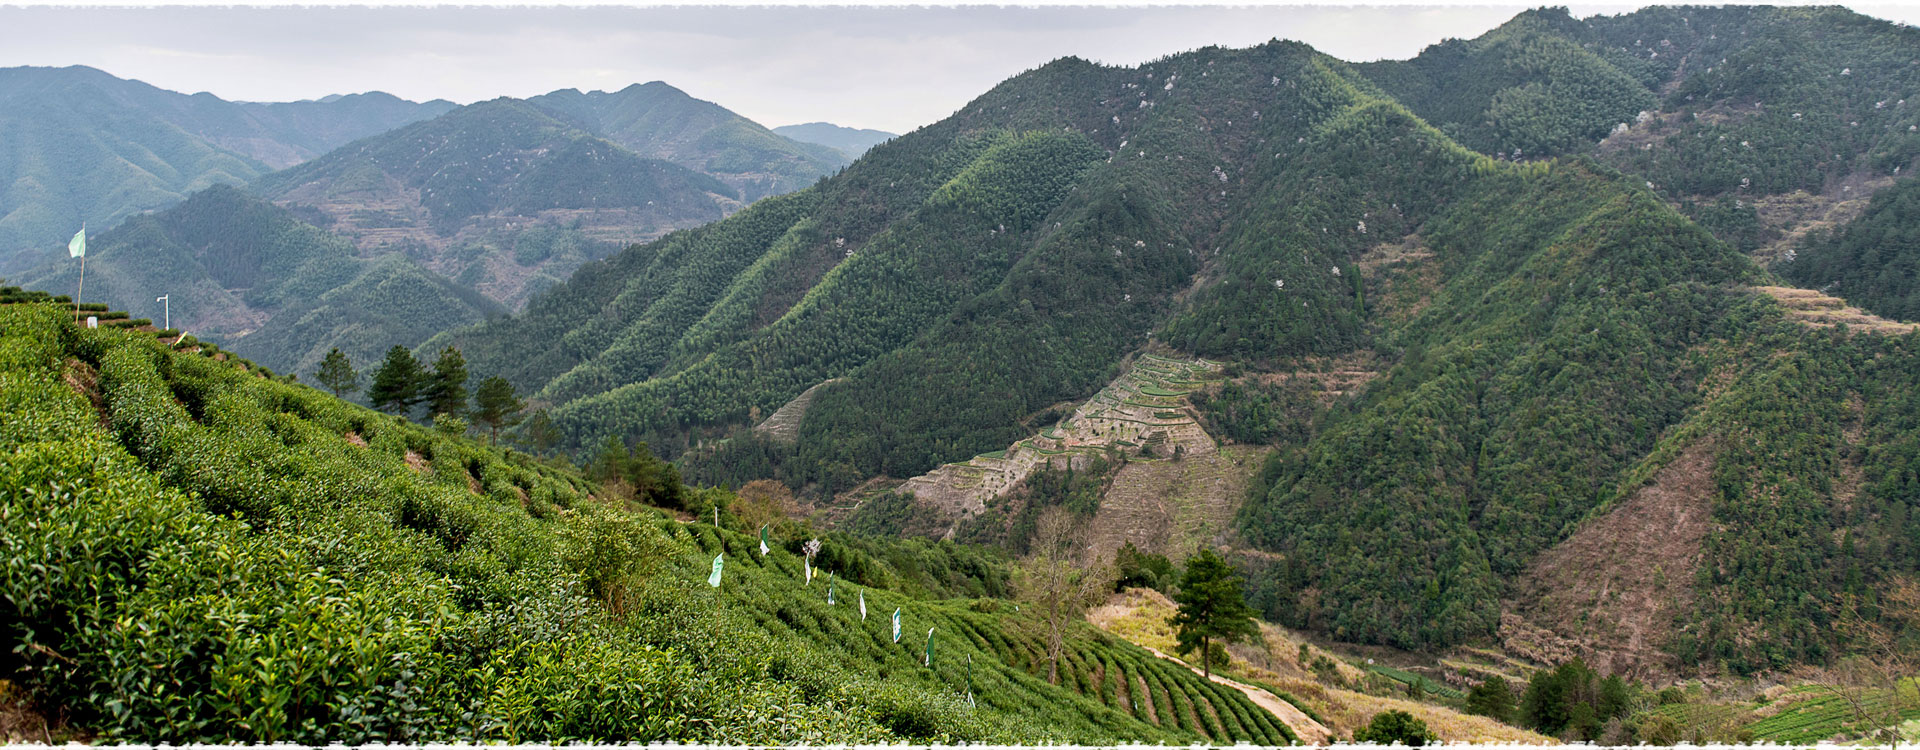 Le jardin de thé Lishui